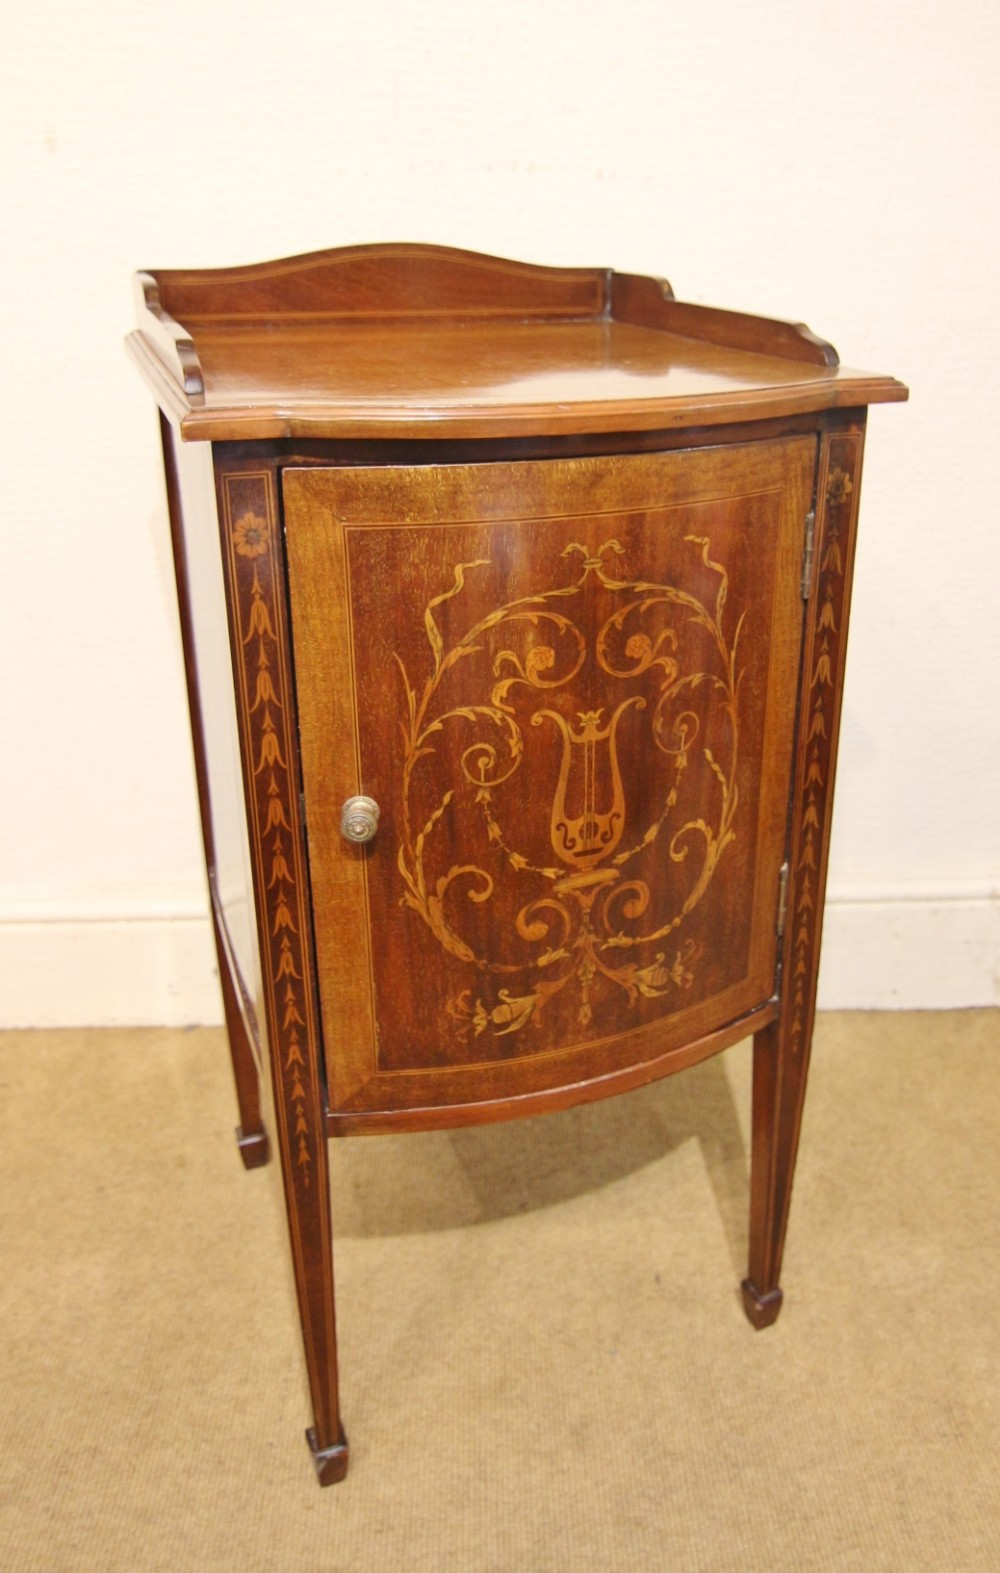 sheraton style inlaid edwardian bedside pot cupboard